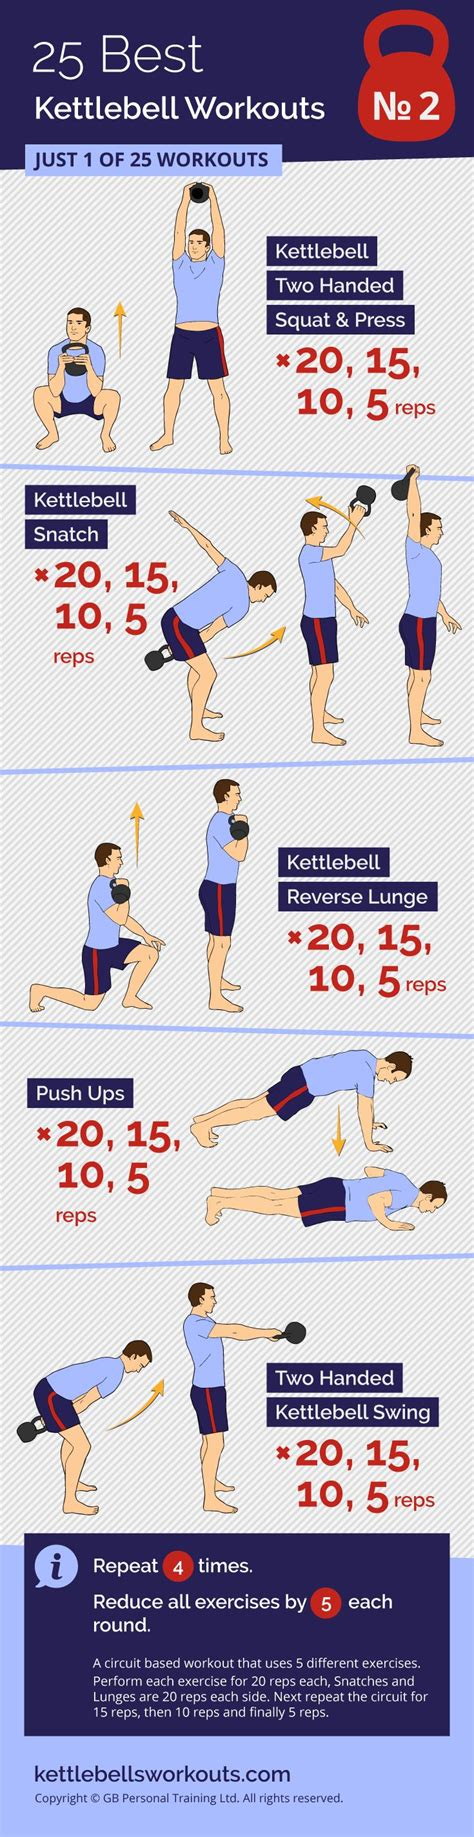 circuit kettlebell take kettle bell workout workouts kettlebellsworkouts body training artikkeli five exercise